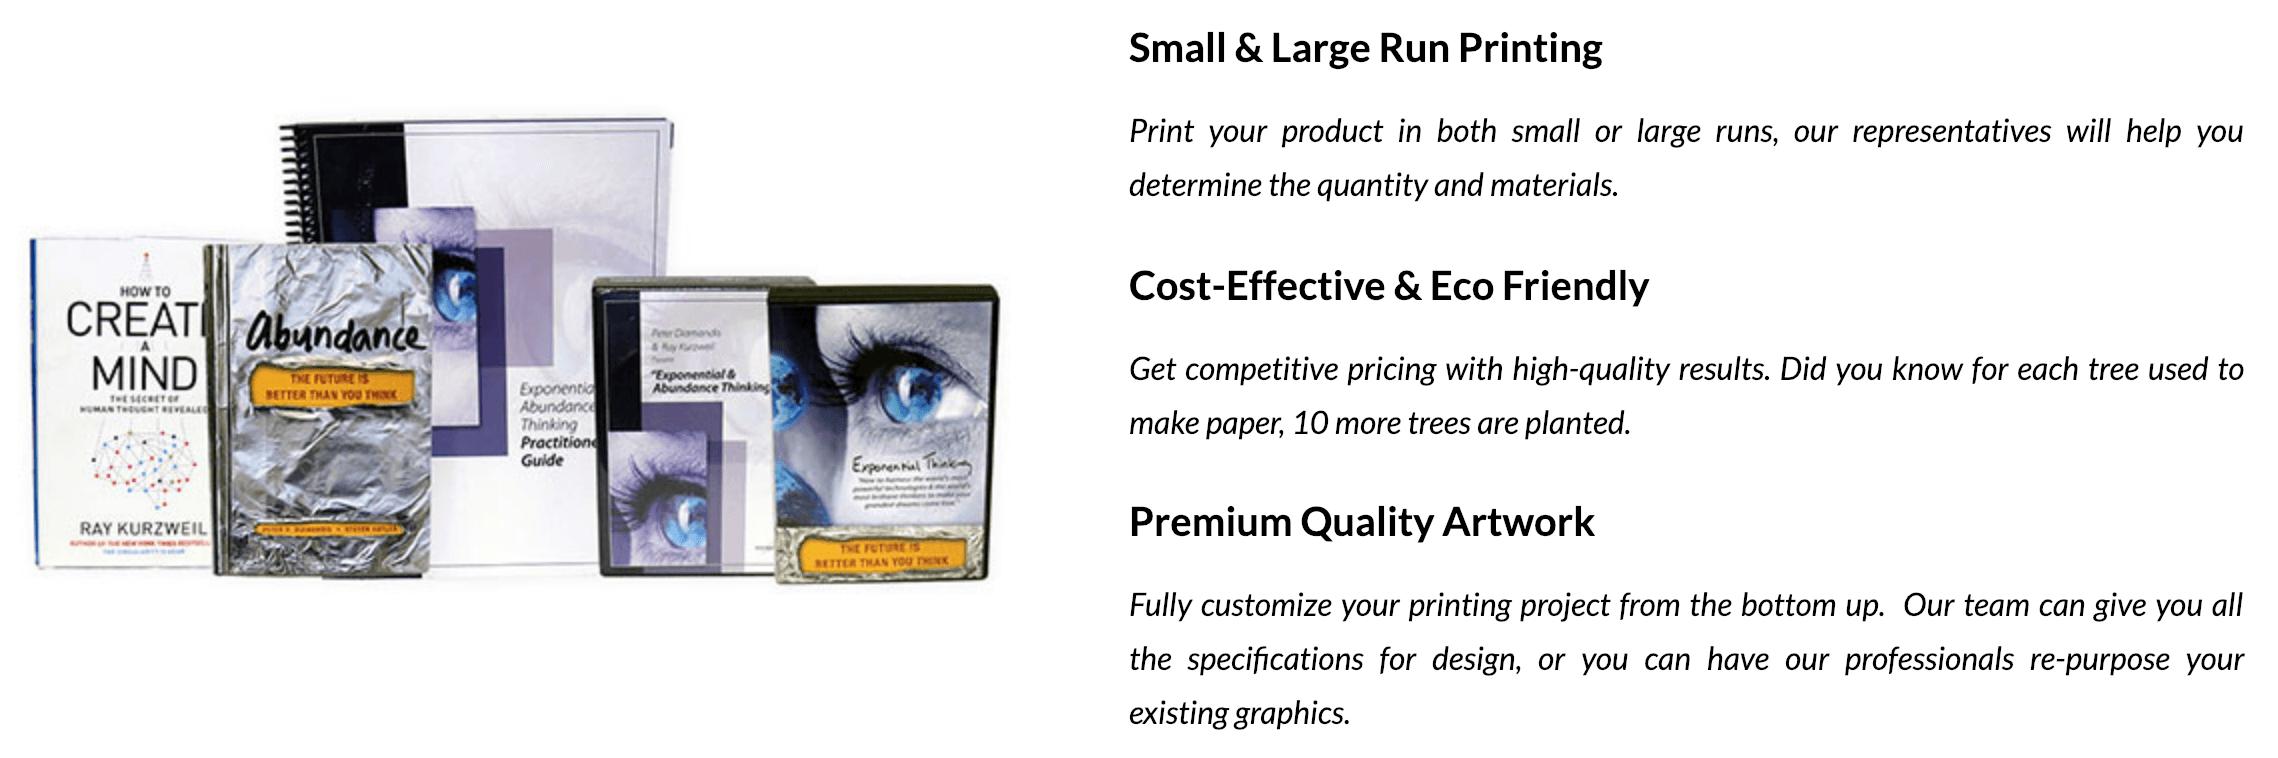 disk custom print image